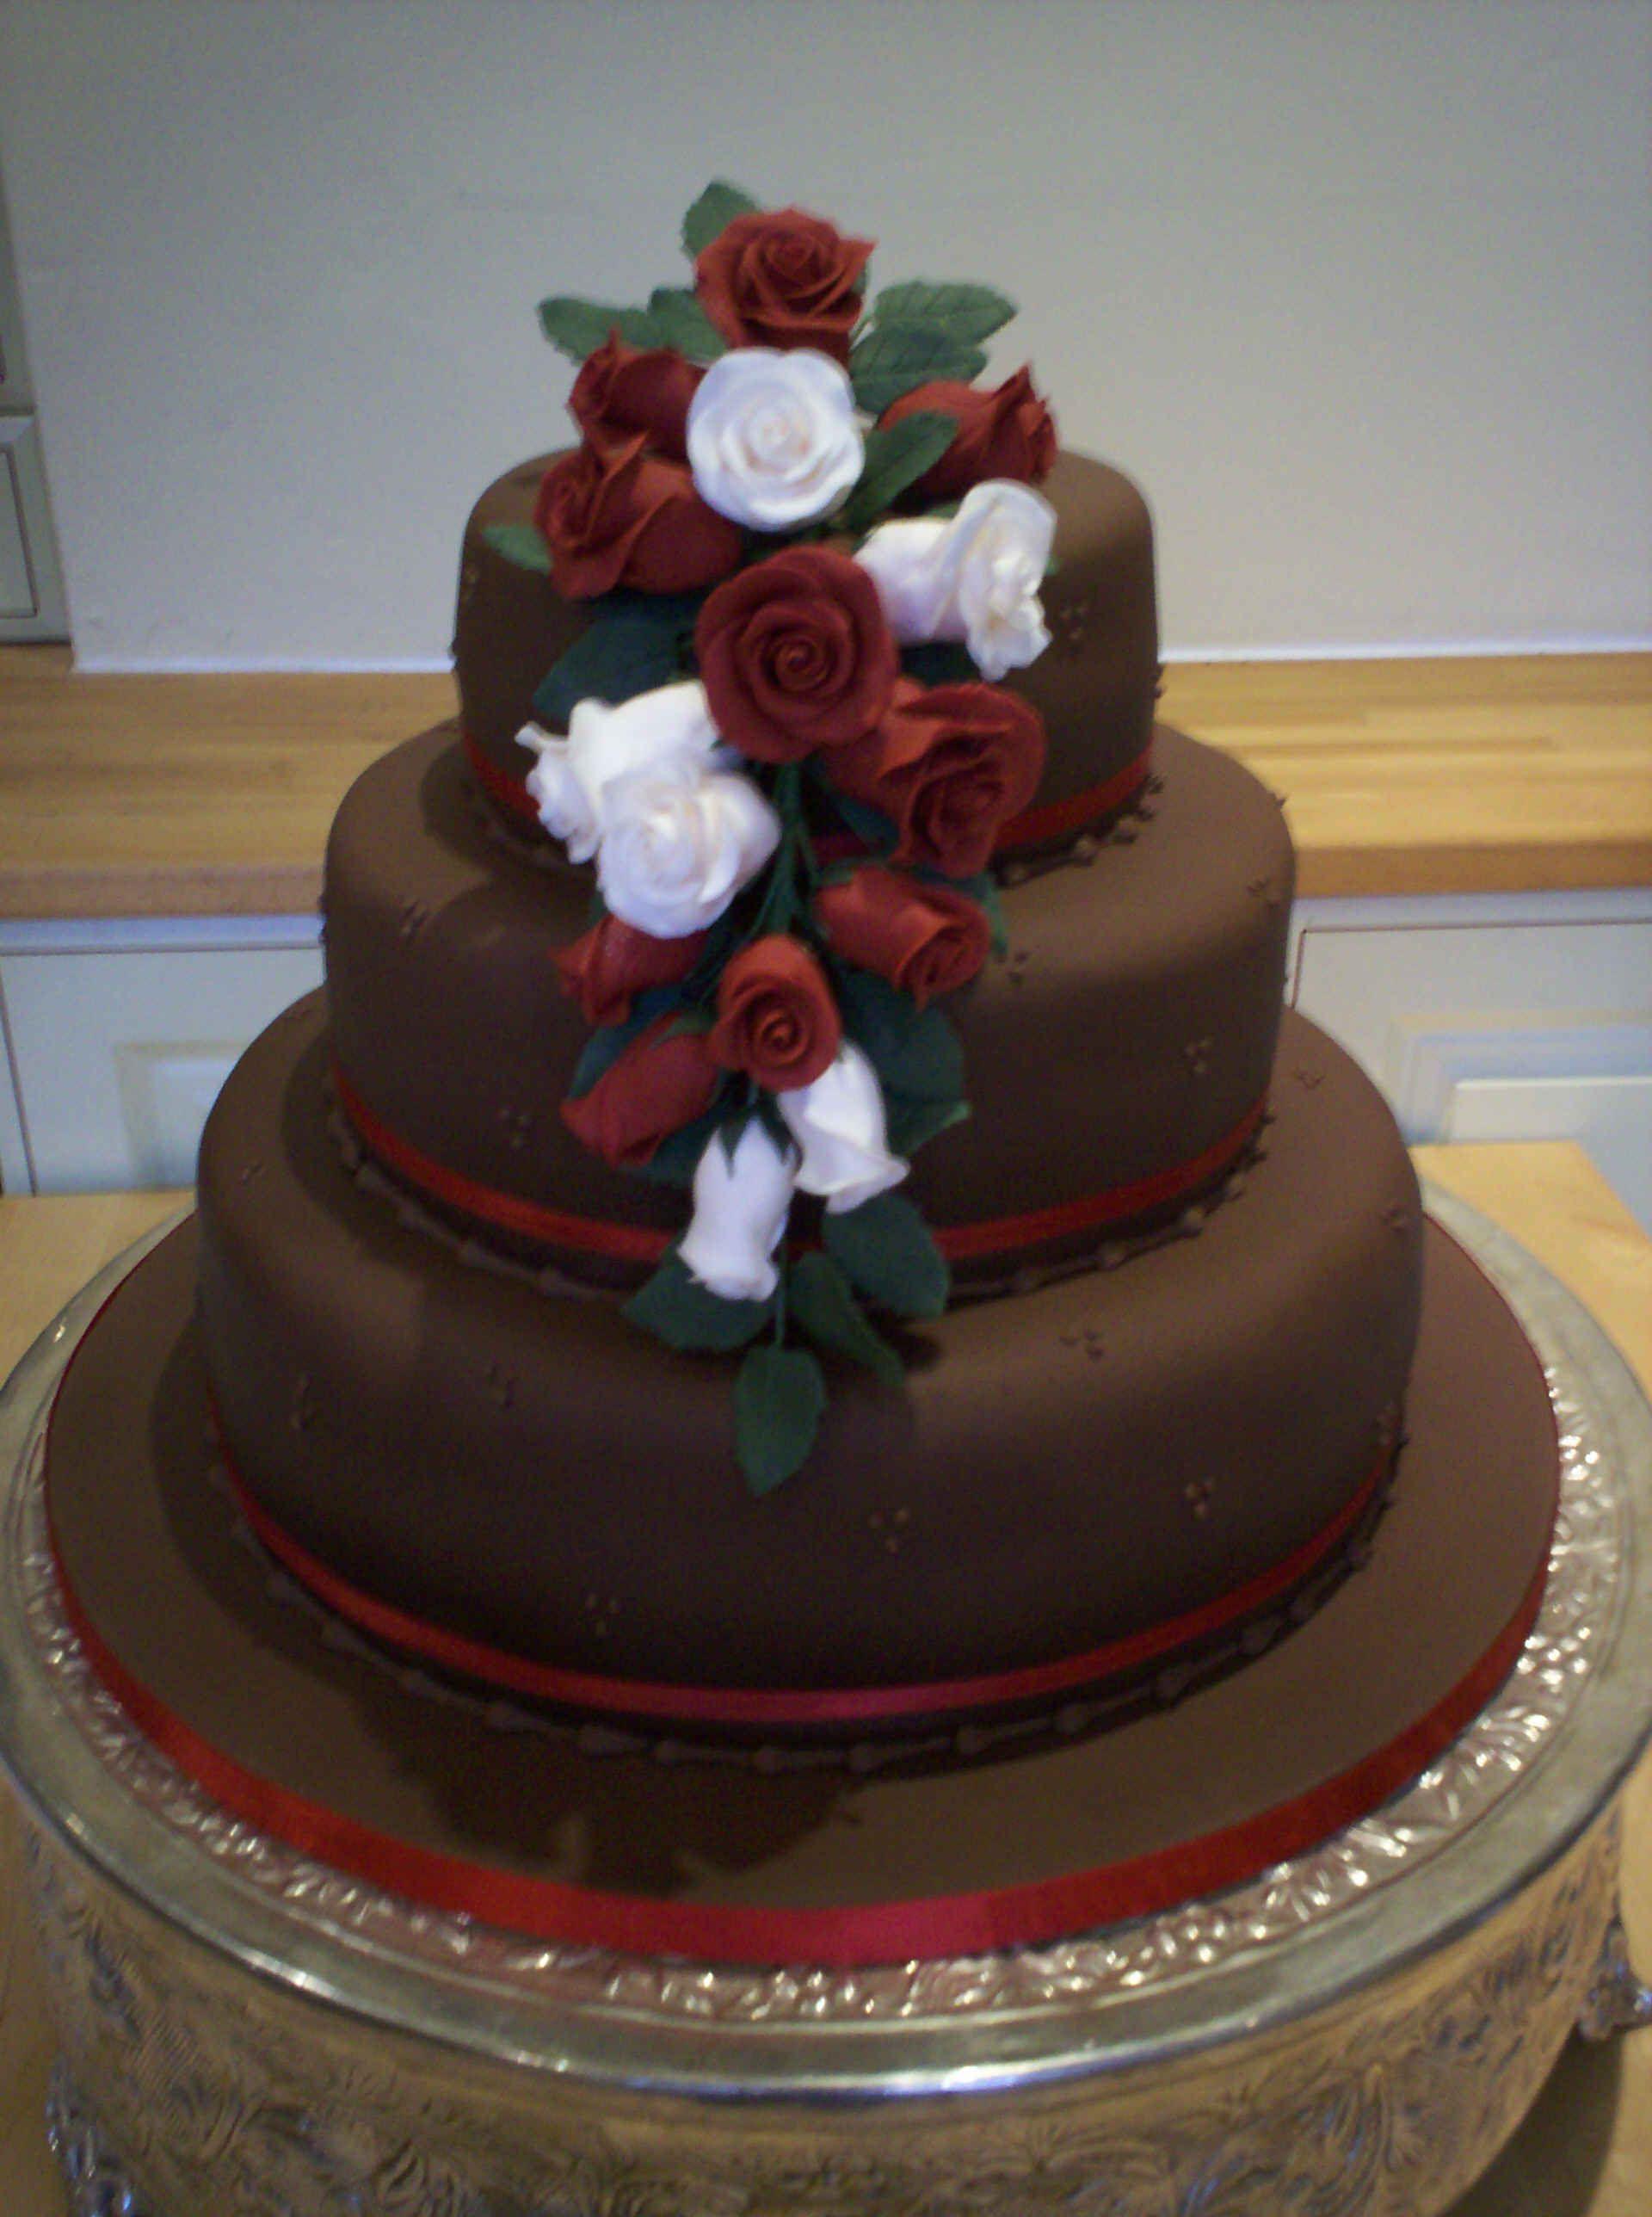 30 Best Chocolate Cake Ever Chocolate cake, Chocolate